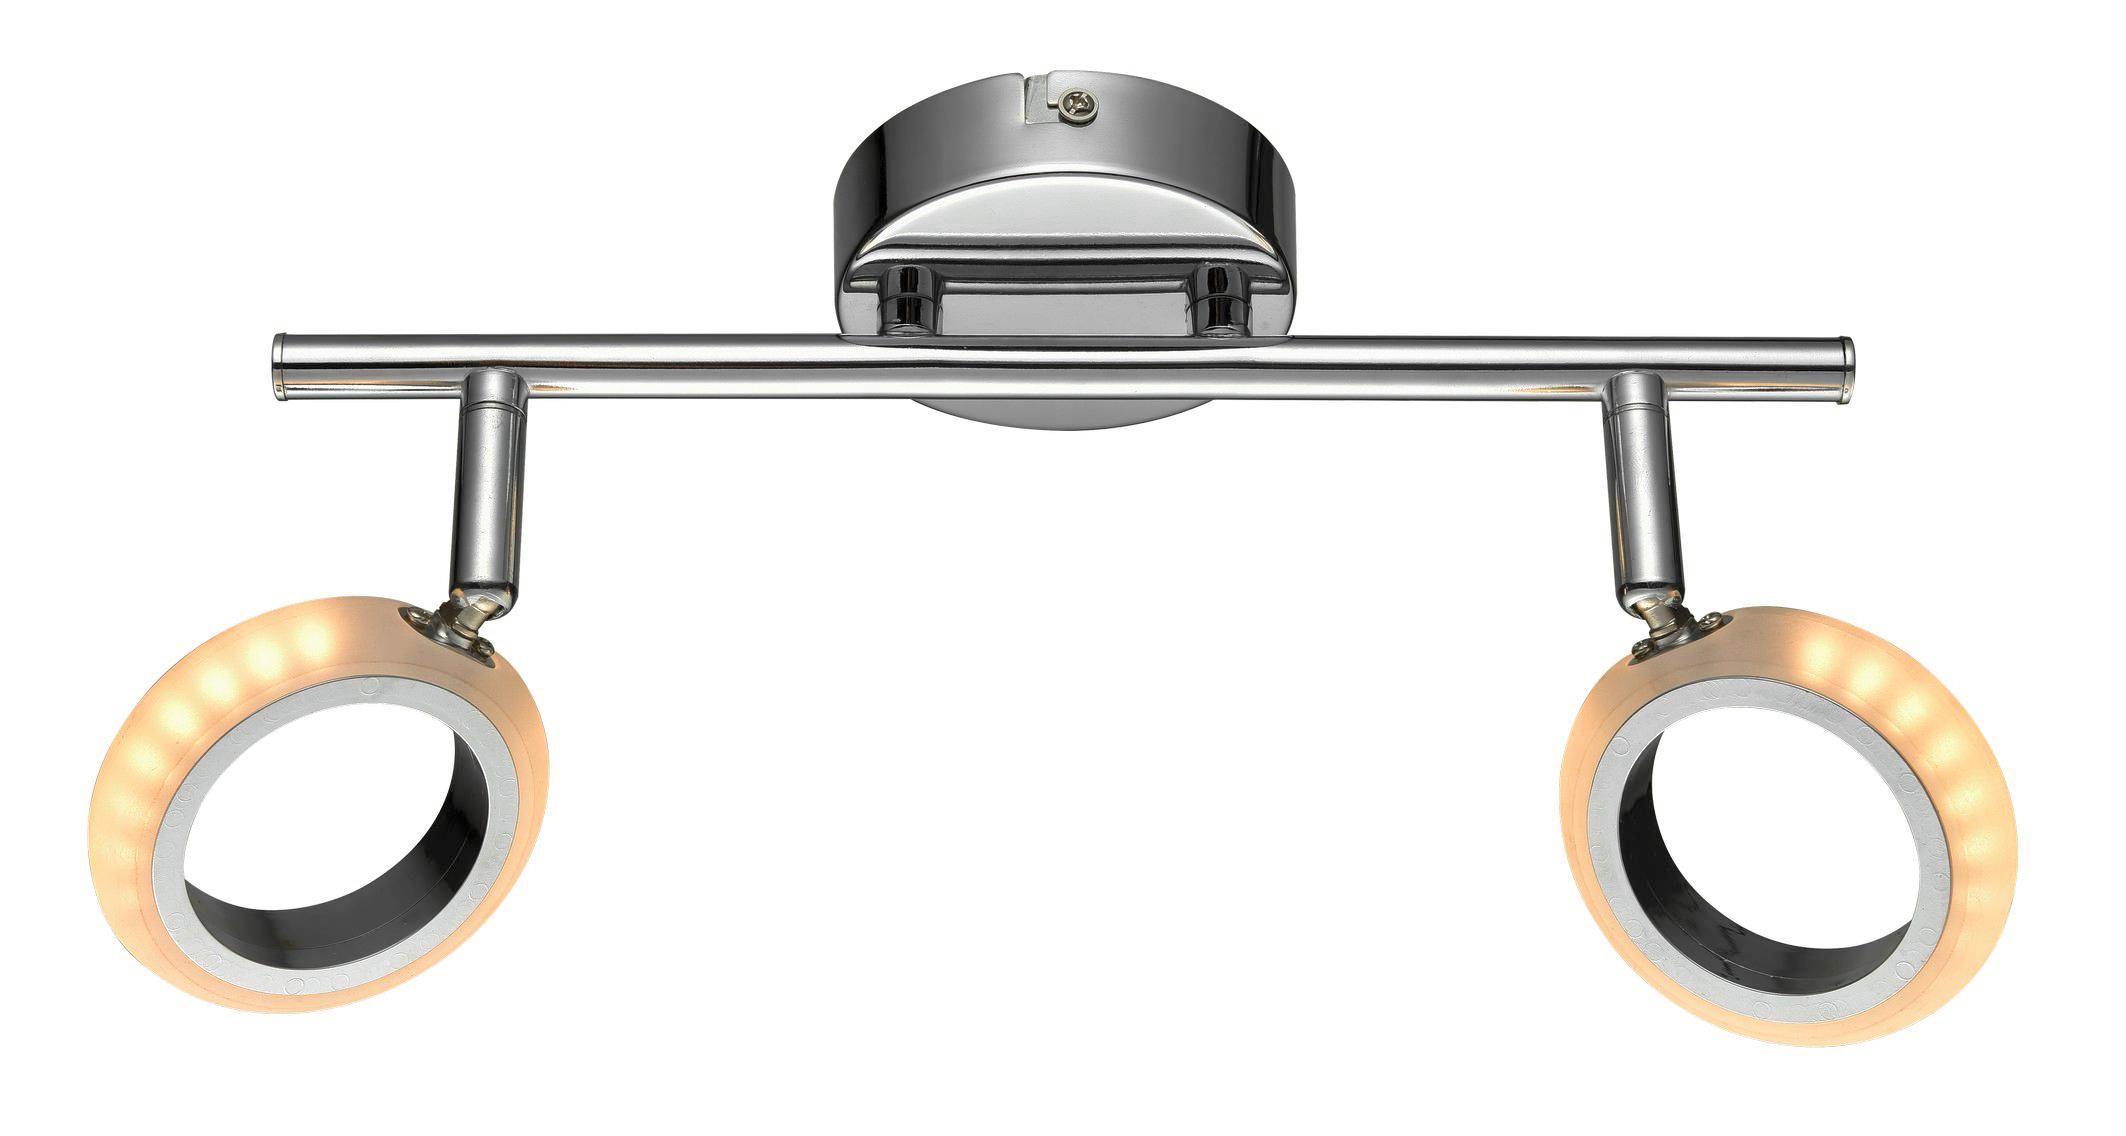 LED-Strahler Tino max. 4 Watt - MODERN, Kunststoff/Metall (34/18,5cm) - MÖMAX modern living